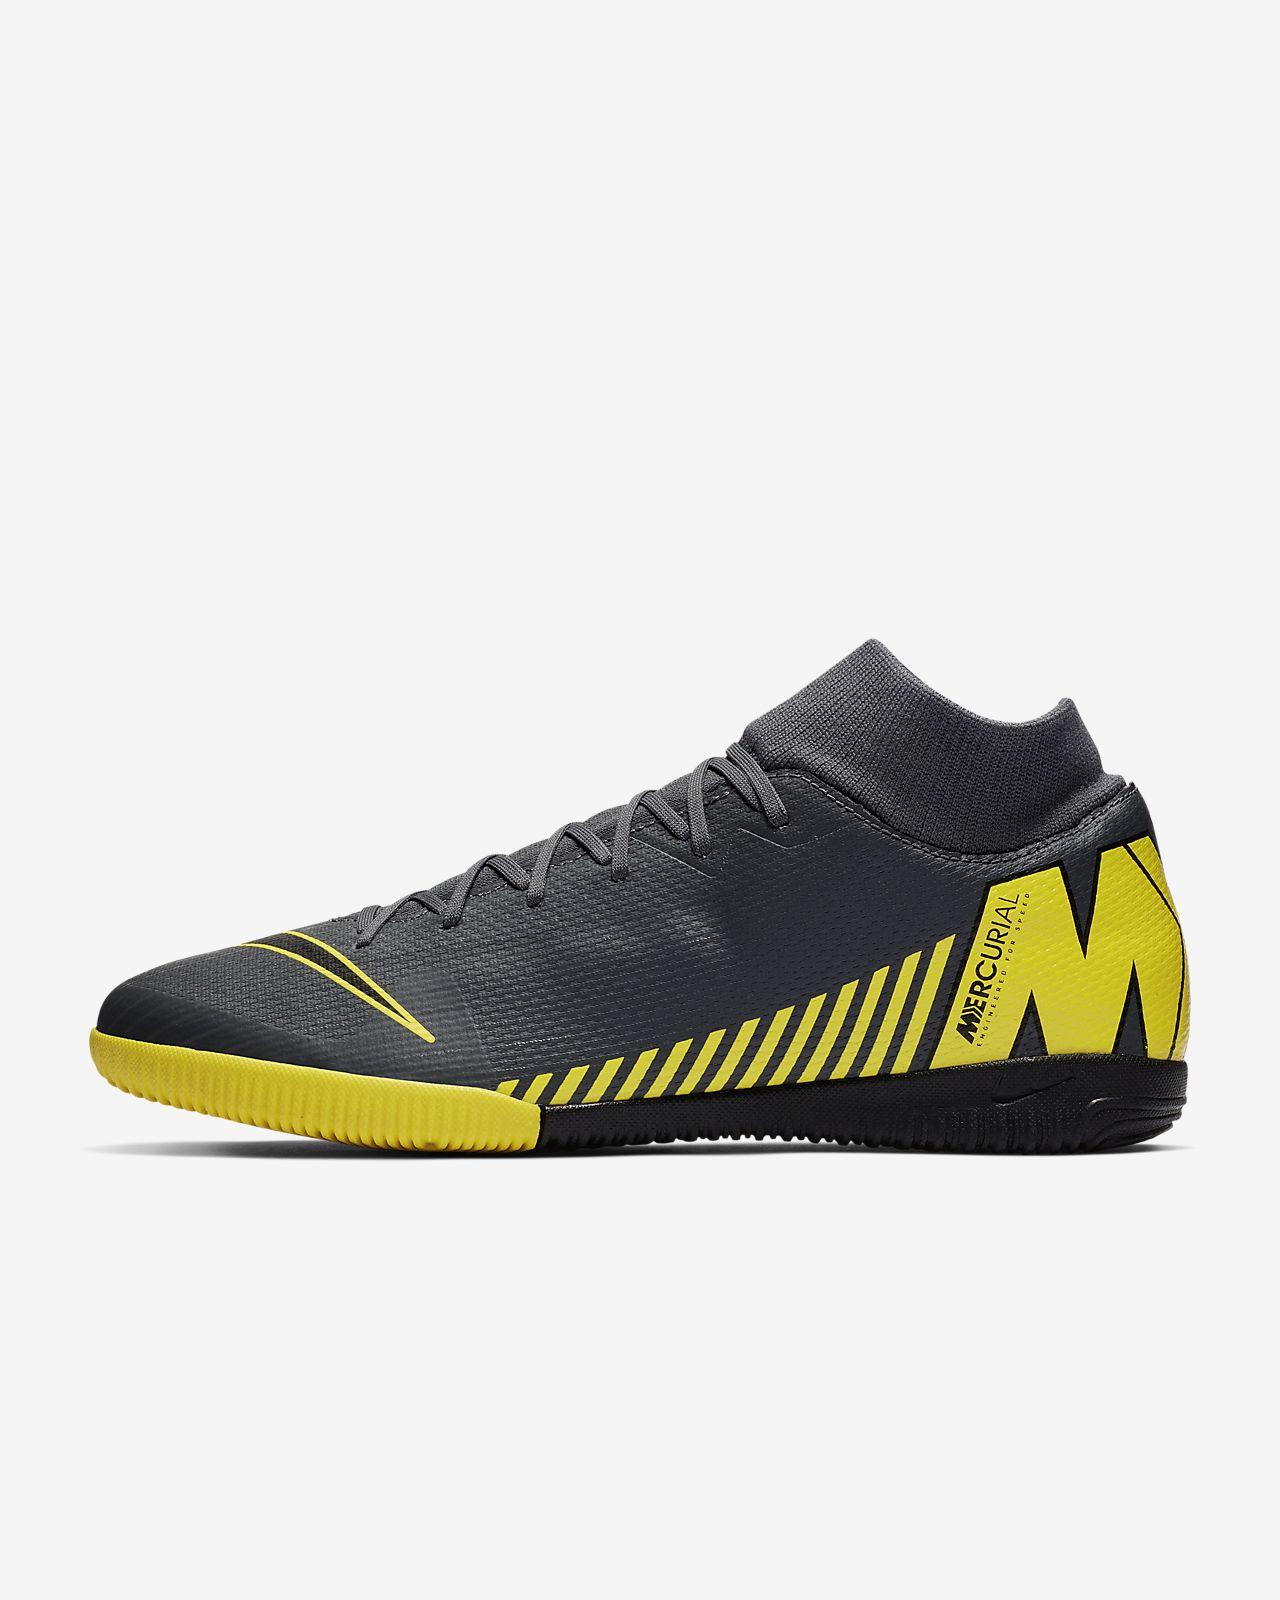 Nike SuperflyX 6 Academy IC Indoor/Court Football Boot